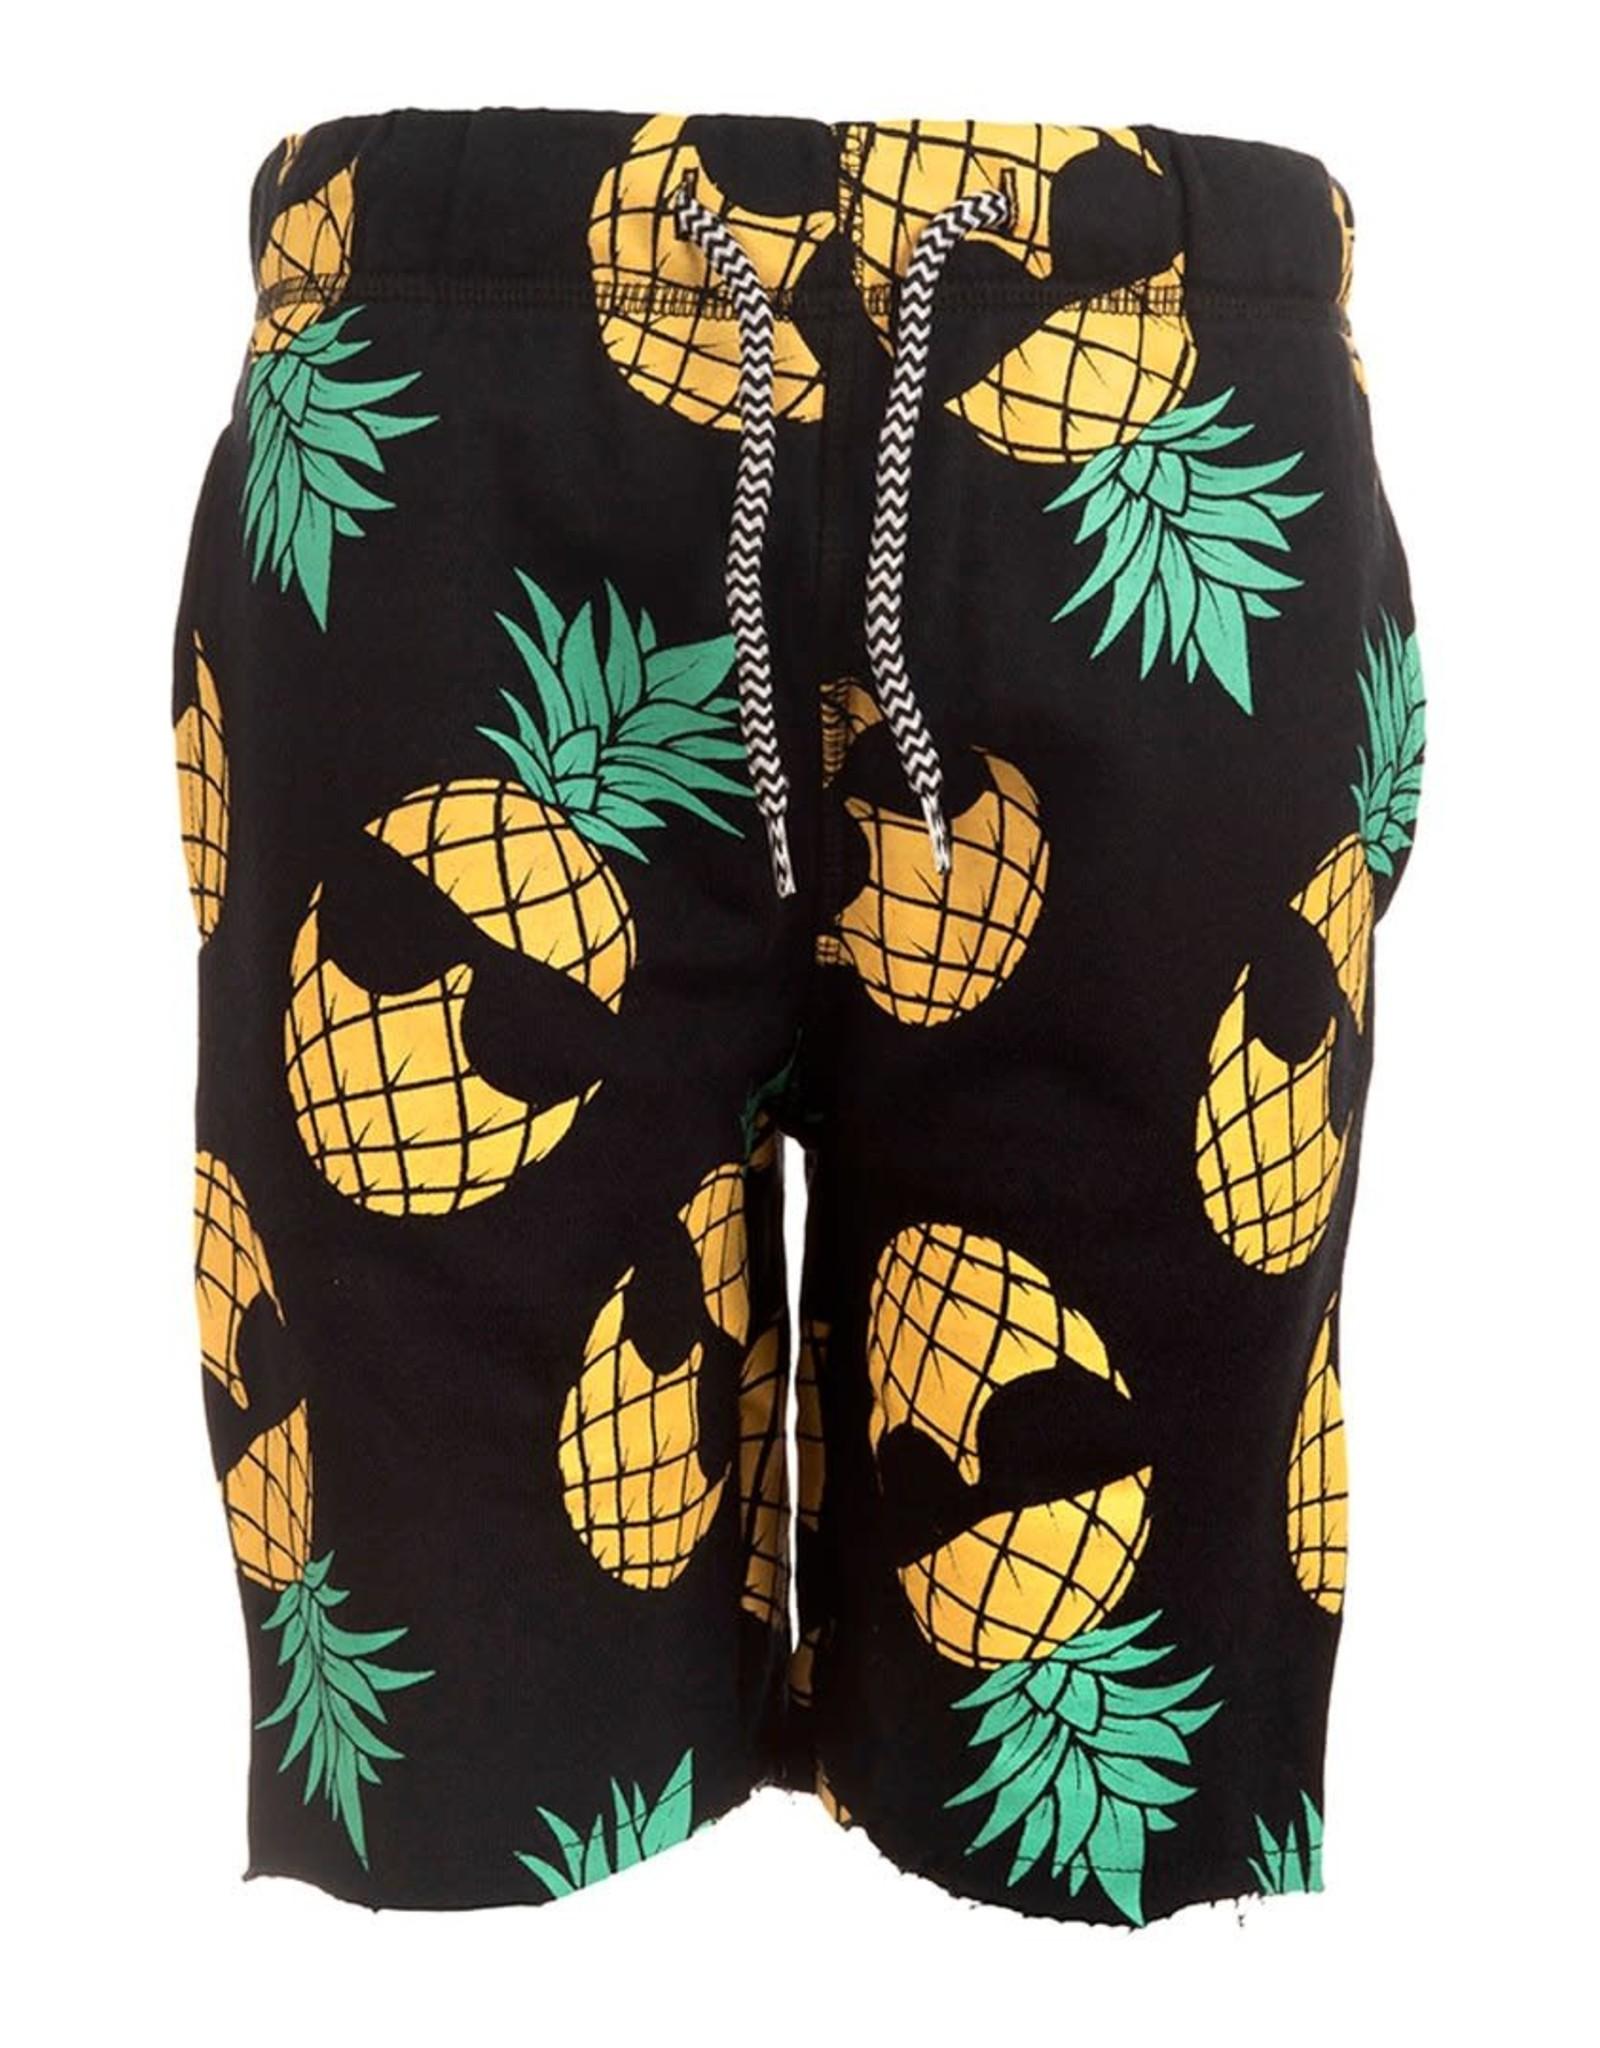 Appaman Appaman Boys Camp Shorts Pineapple Fresh